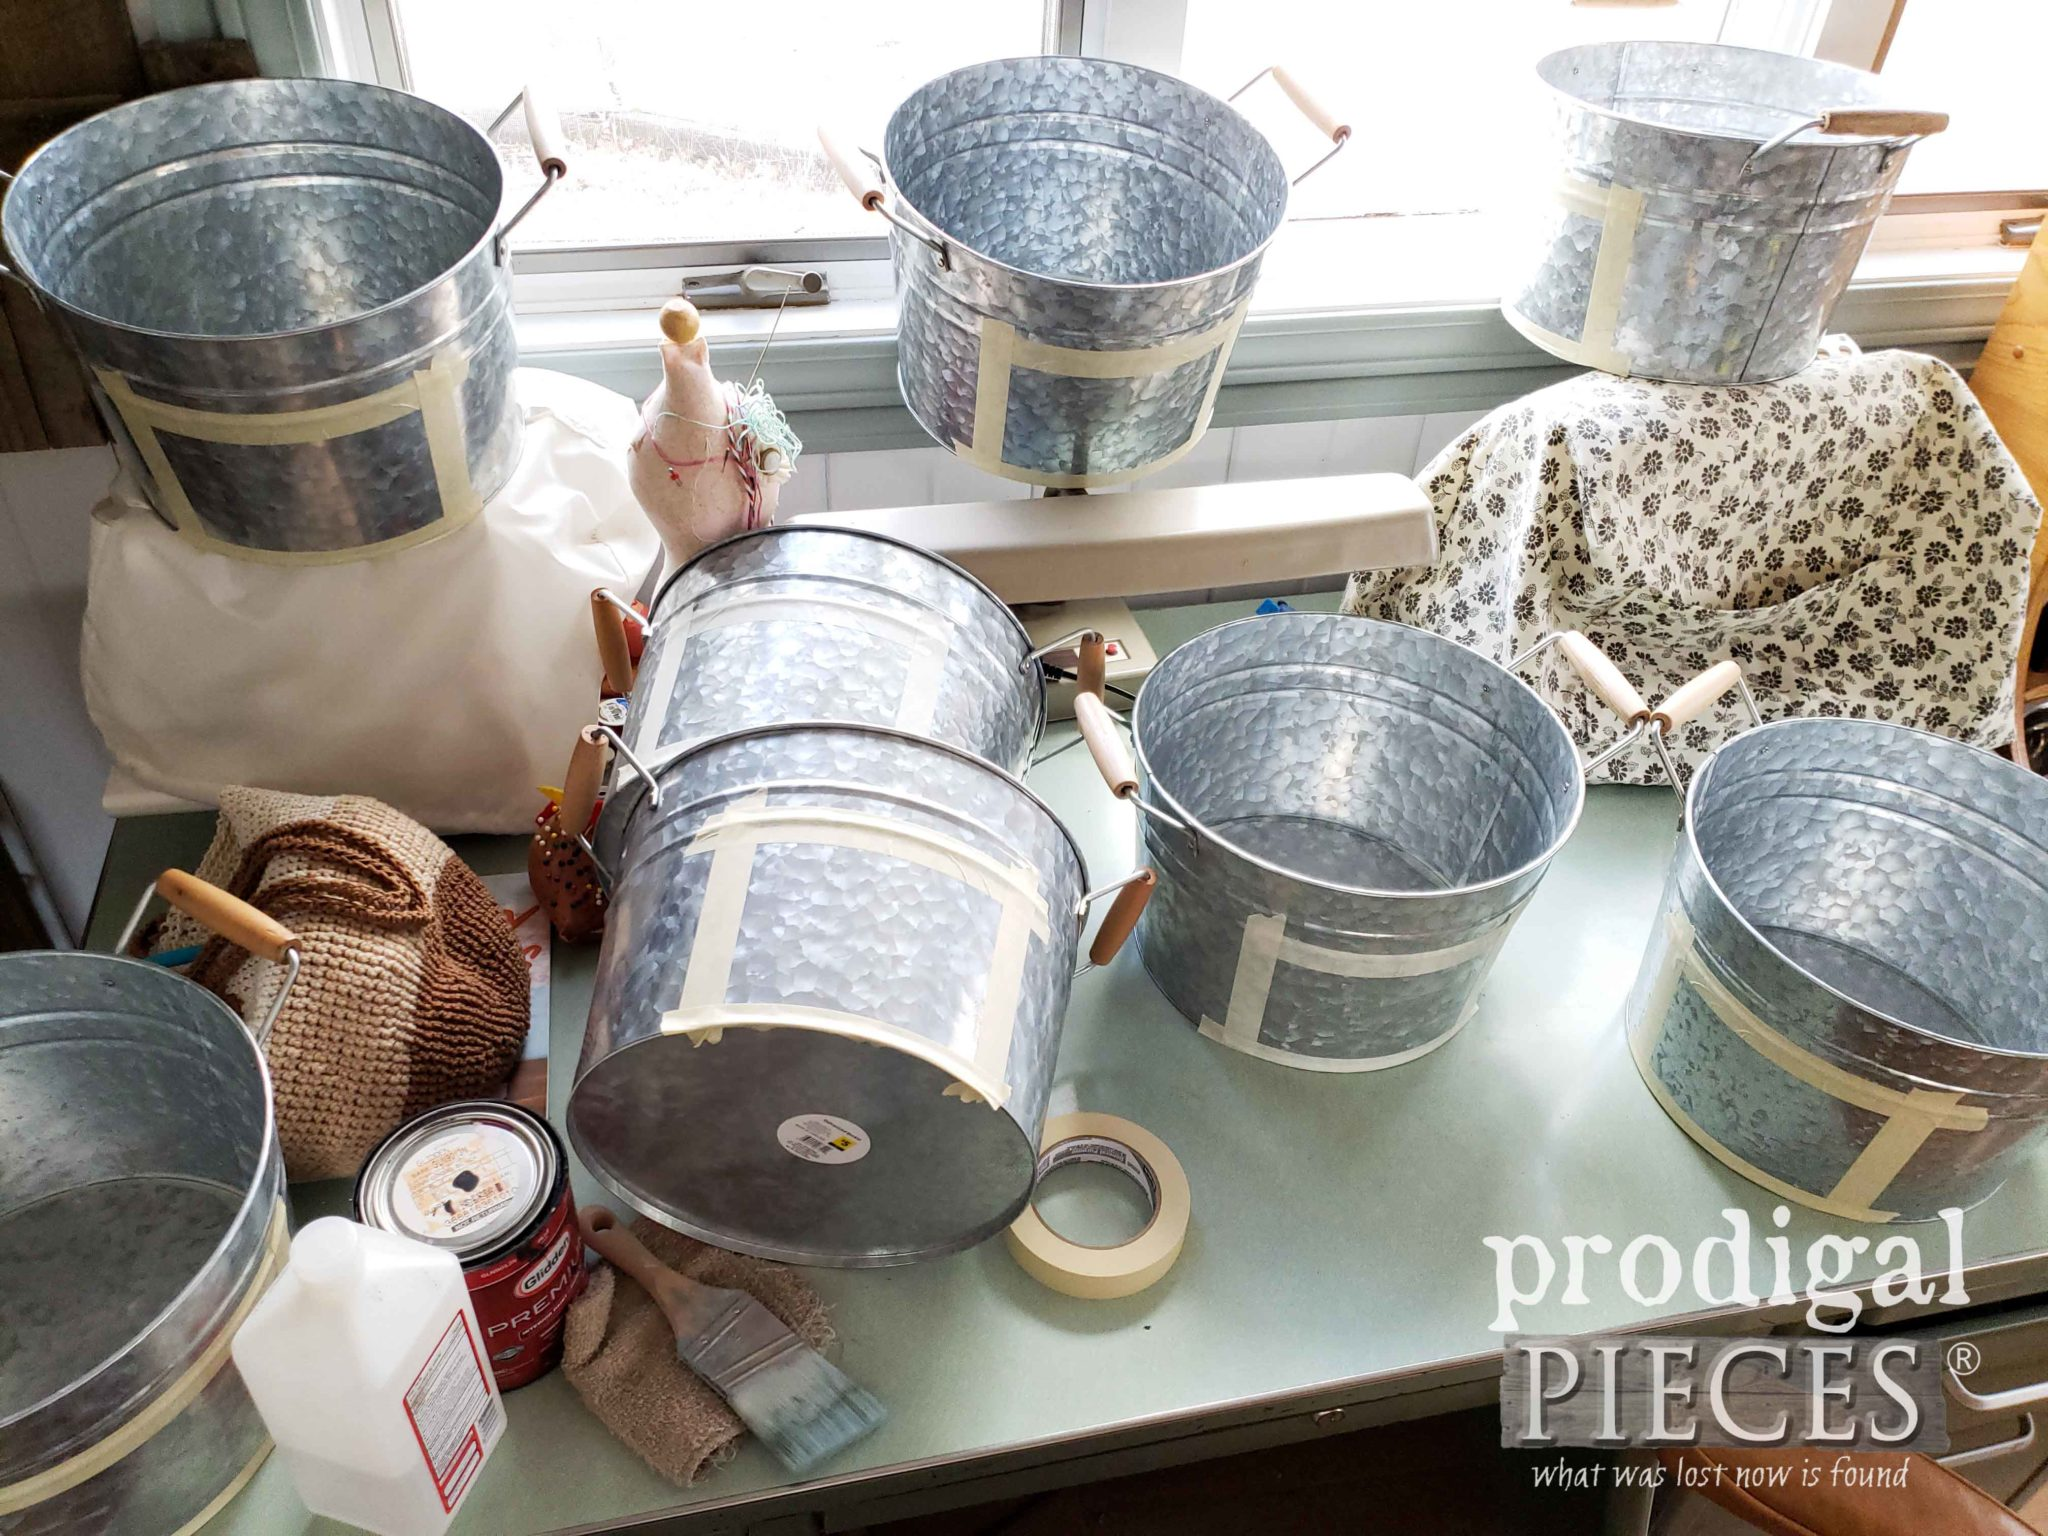 Adding Personalized Names to Galvanized Buckets | prodigalpieces.com